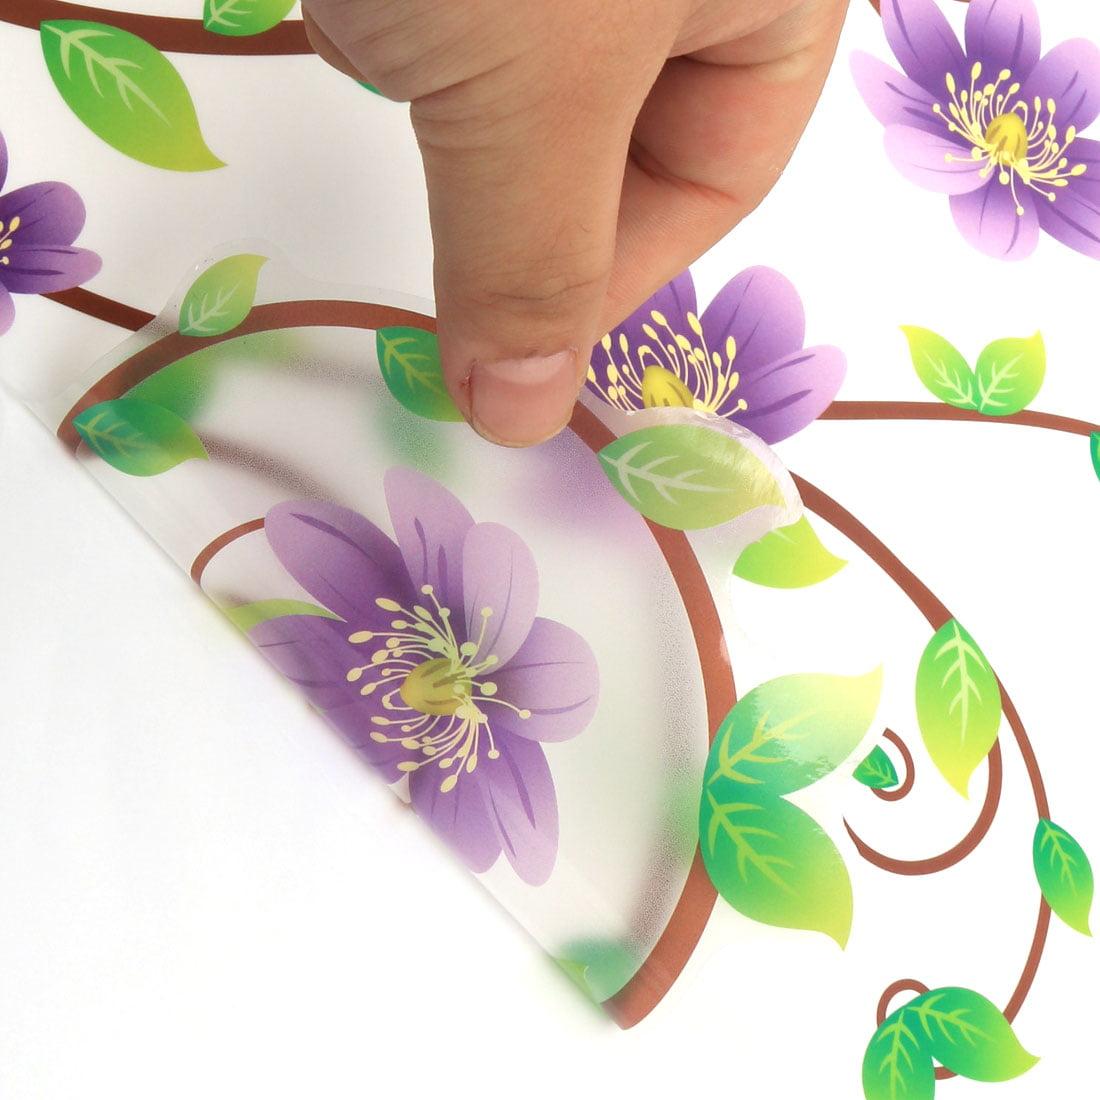 Family Decor Floral Butterfly Print Cabinet Wall Sticker Purple Green 90 x 60cm - image 2 de 4